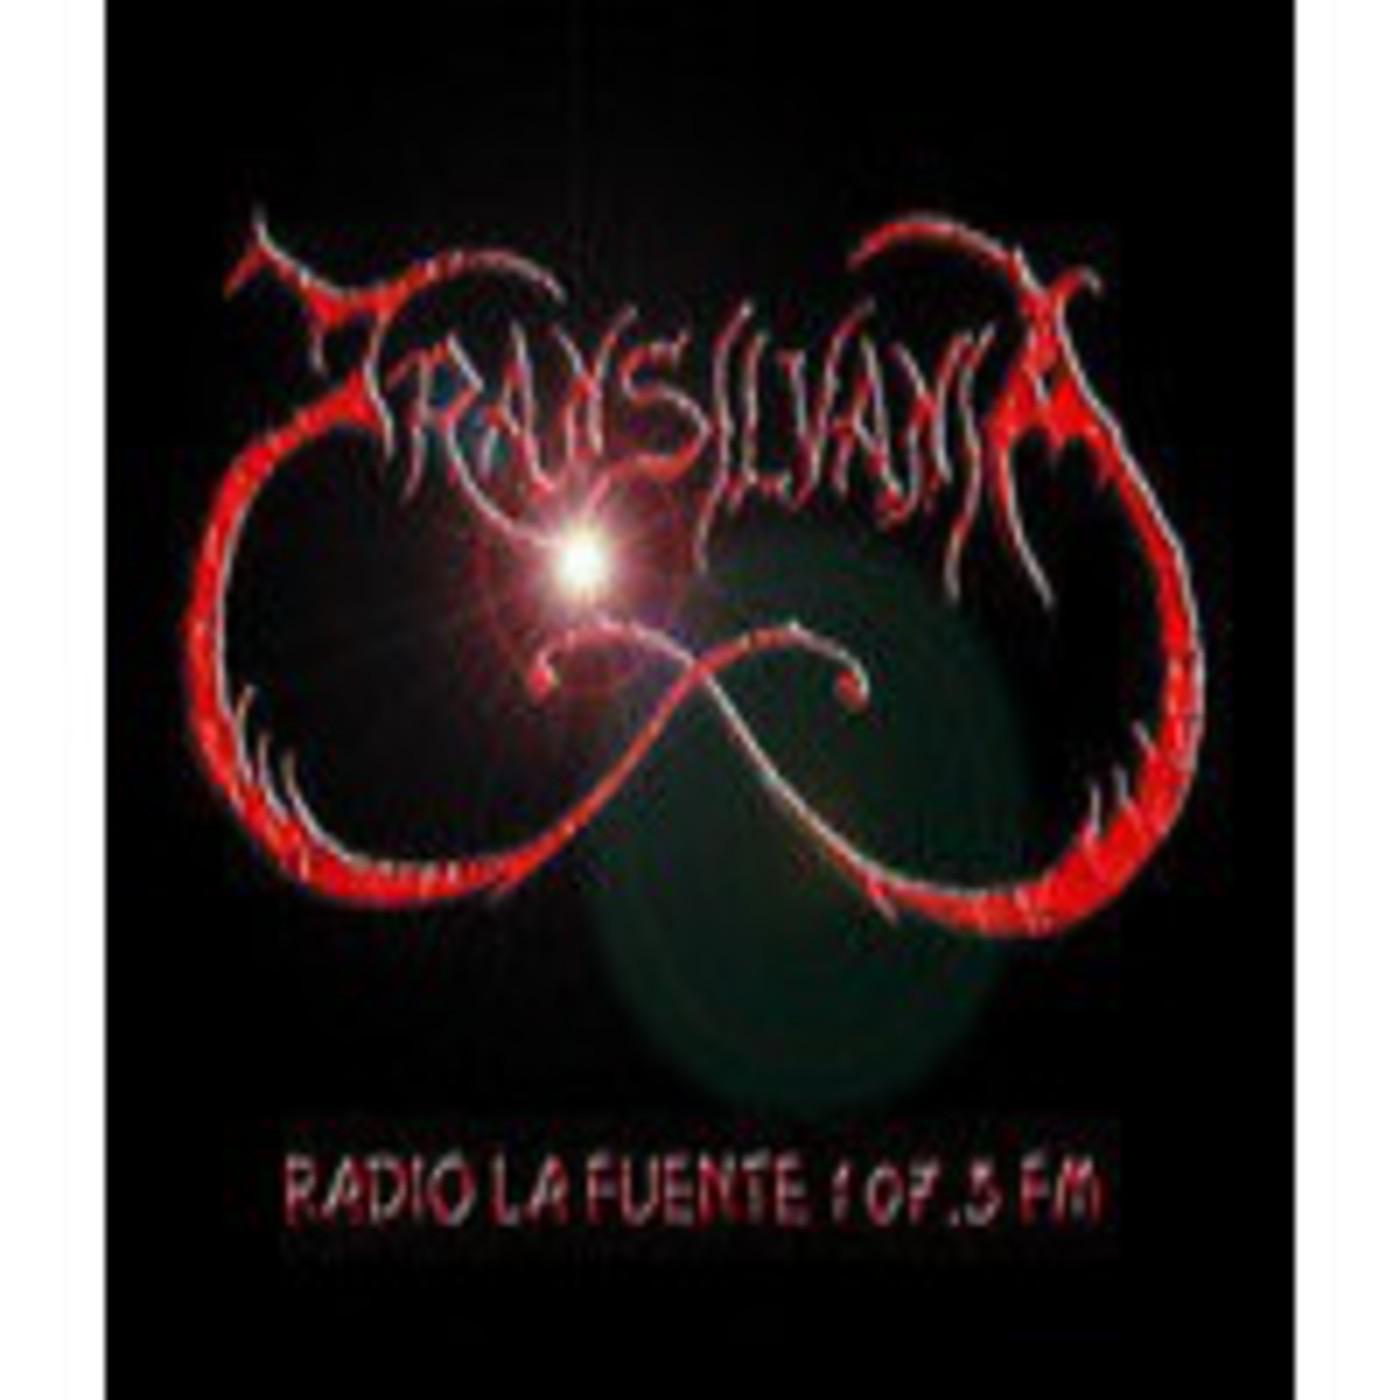 Transylvania - Especial King Diamond